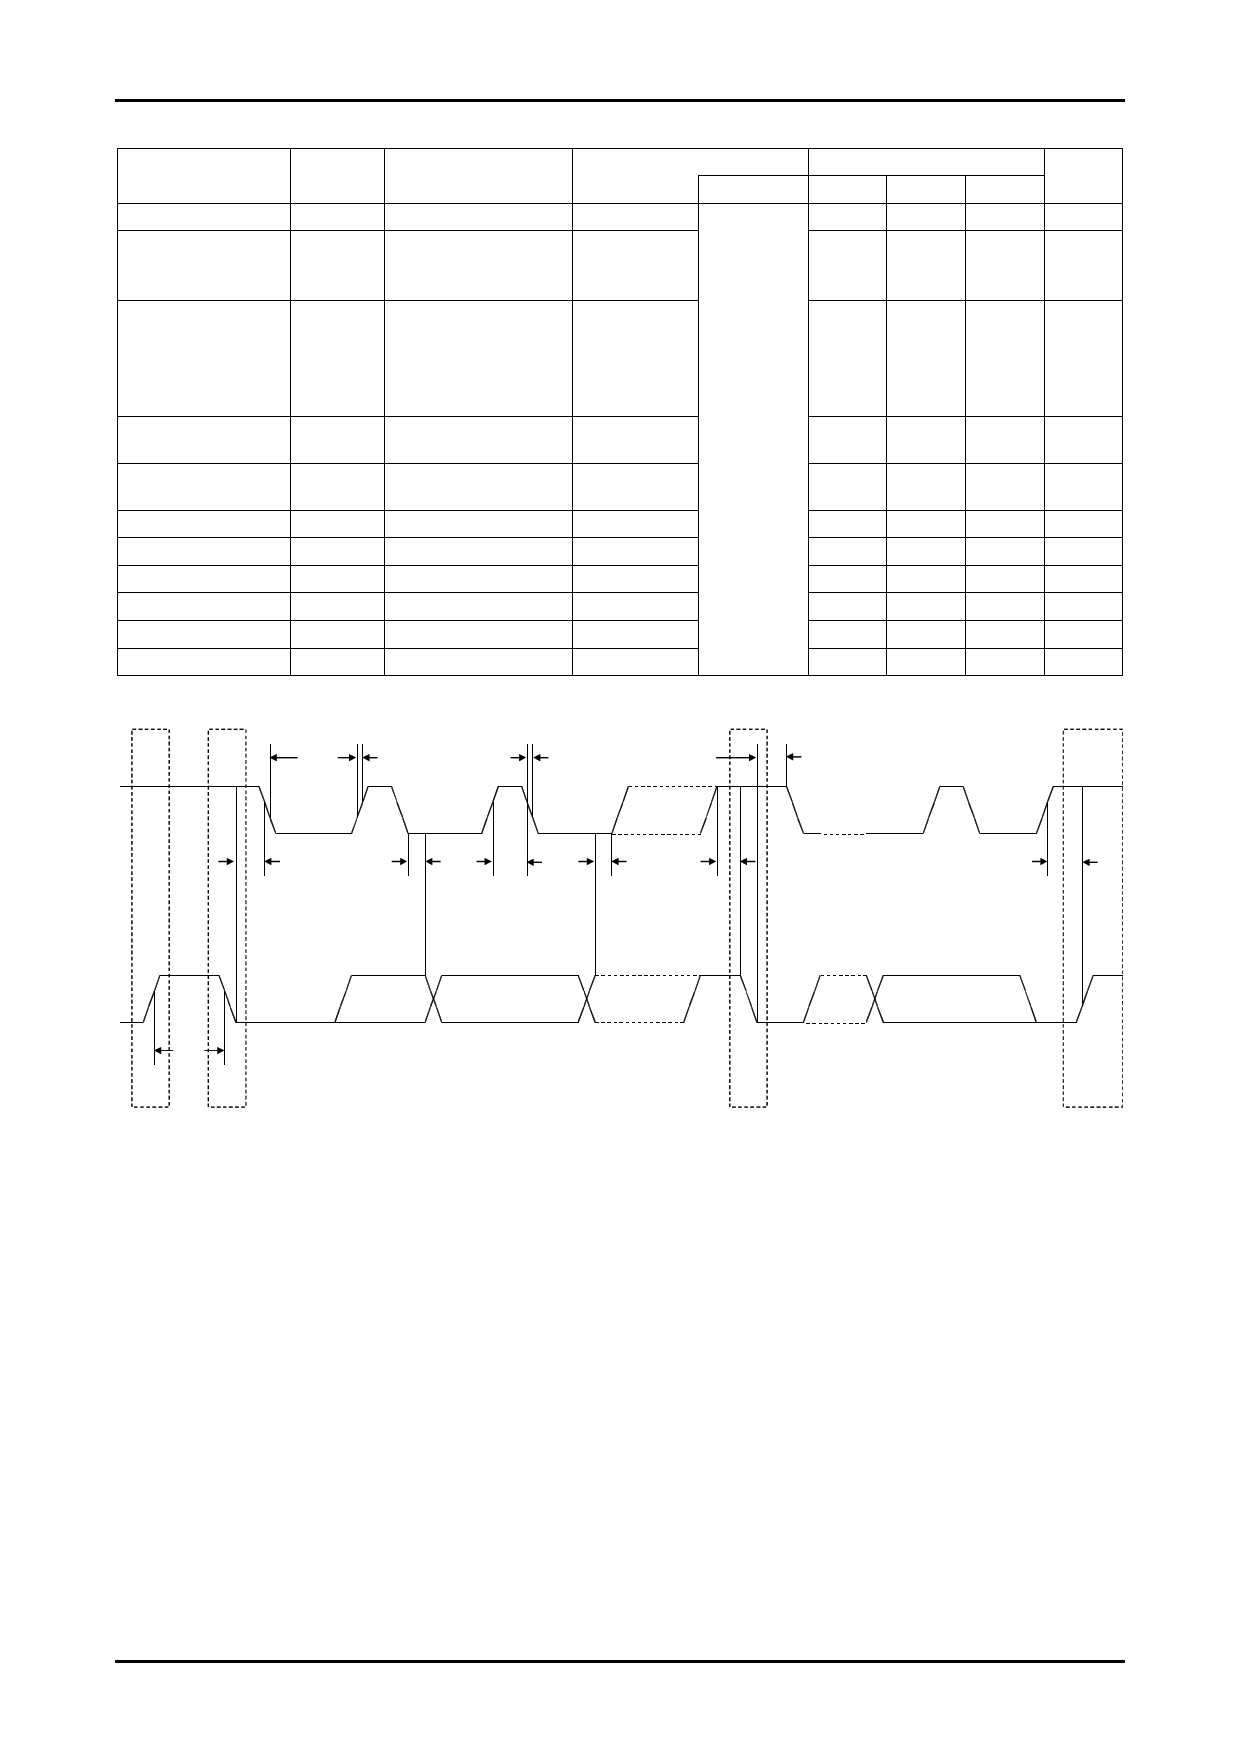 LC709201F 電子部品, 半導体